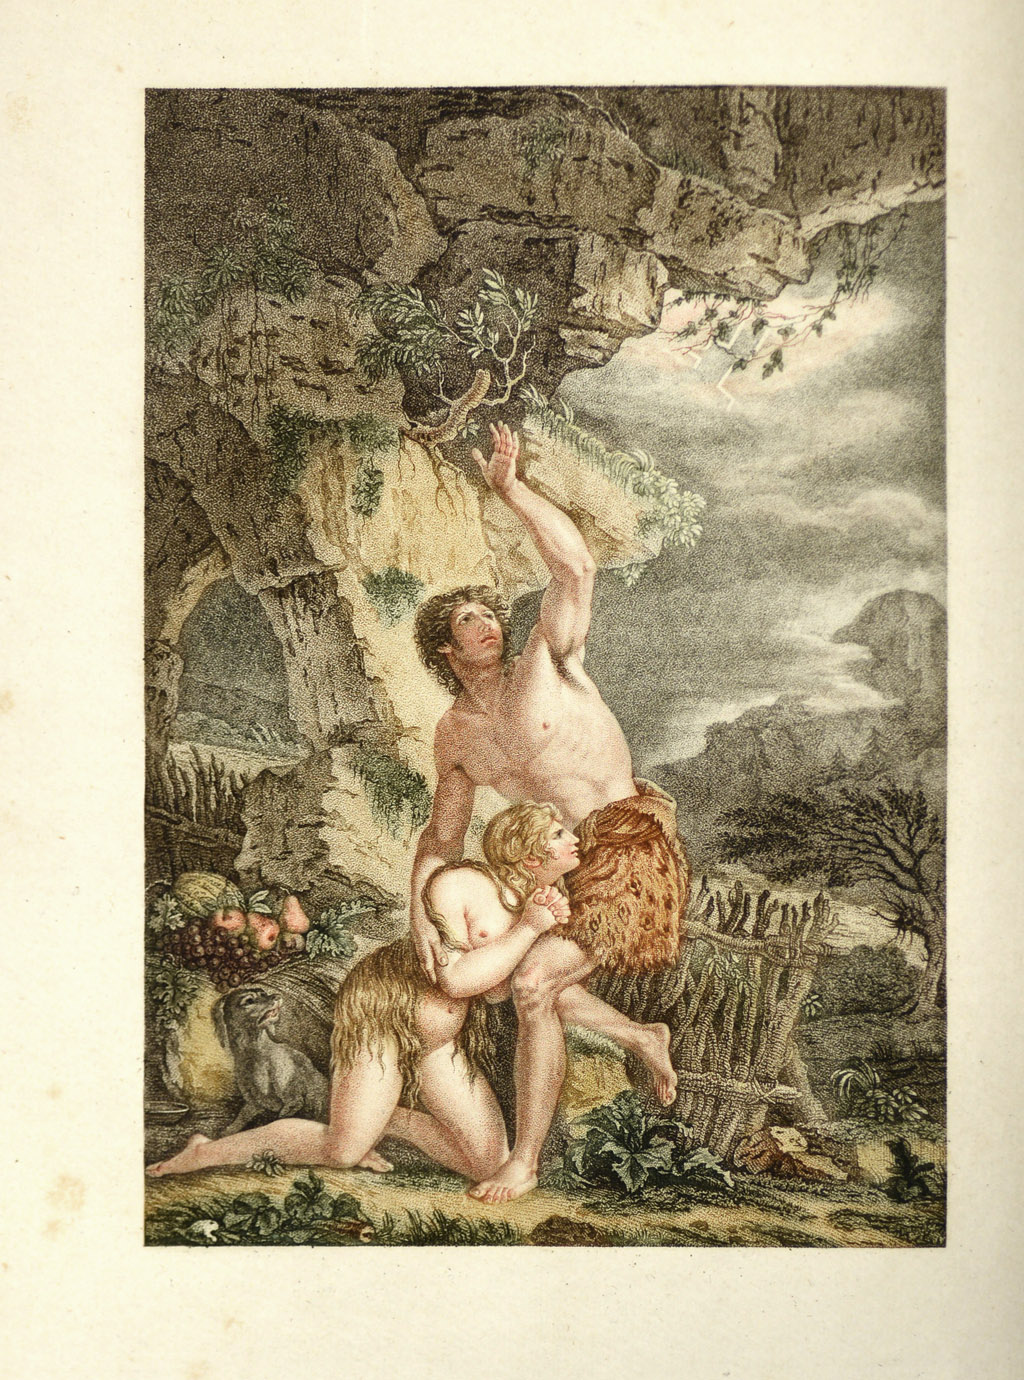 Gessner, Mort d'Abel, 1793.